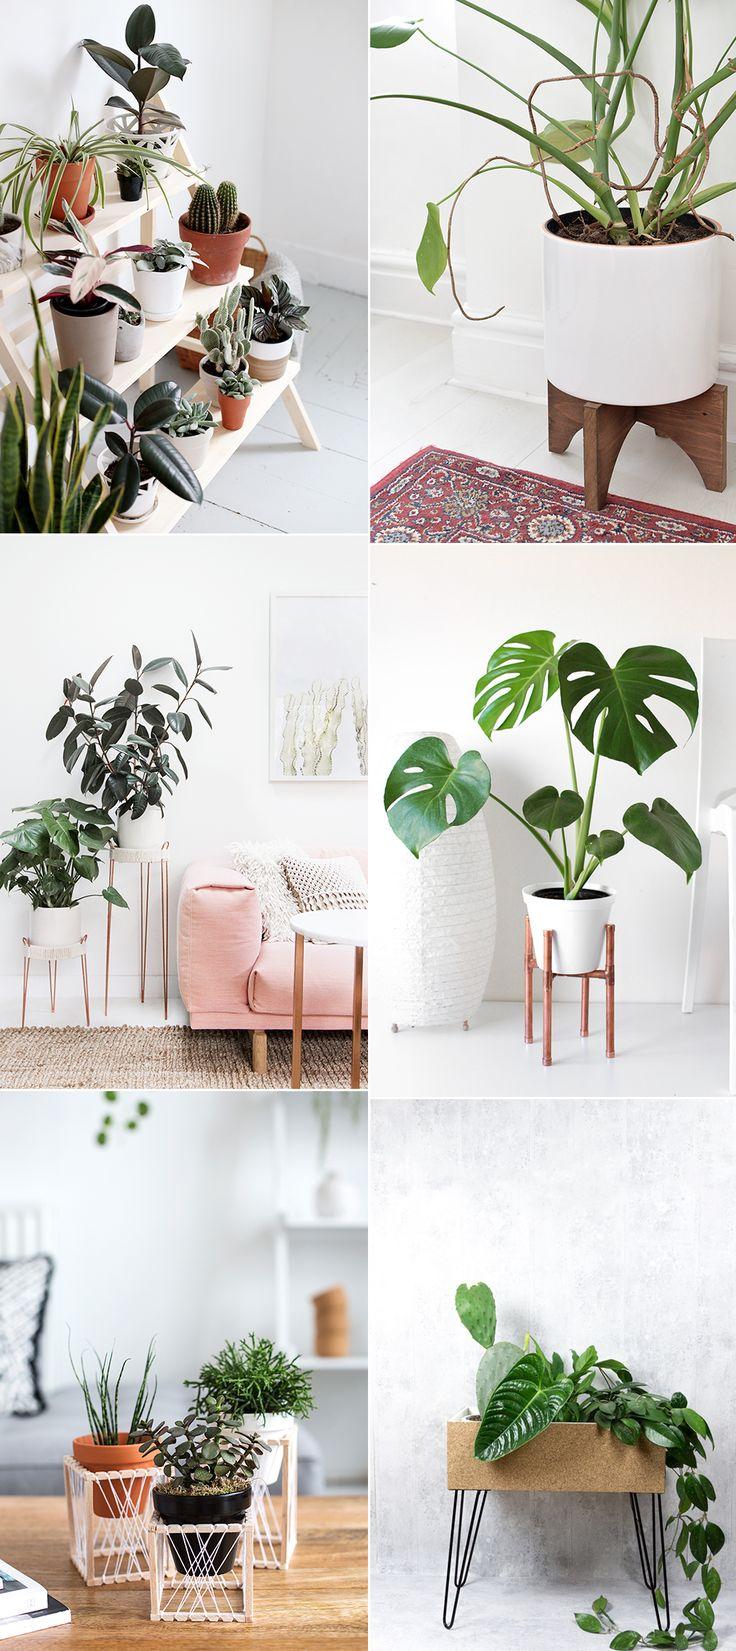 Trendy Ideas For Diy Home : DIY Plant Stands – Pflanzenständer: DIY ...